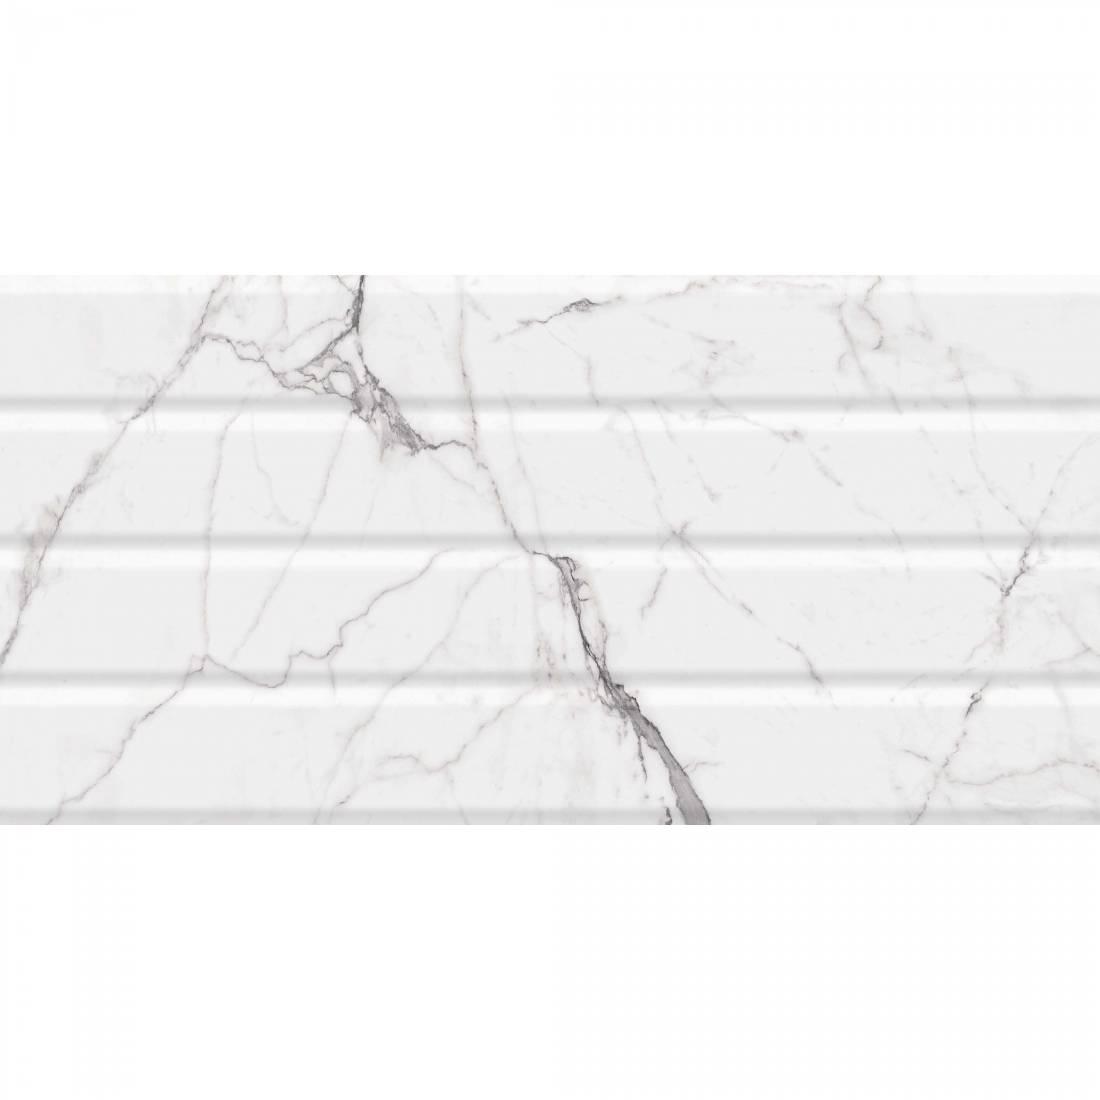 Elgin Decor 30x60 White 1